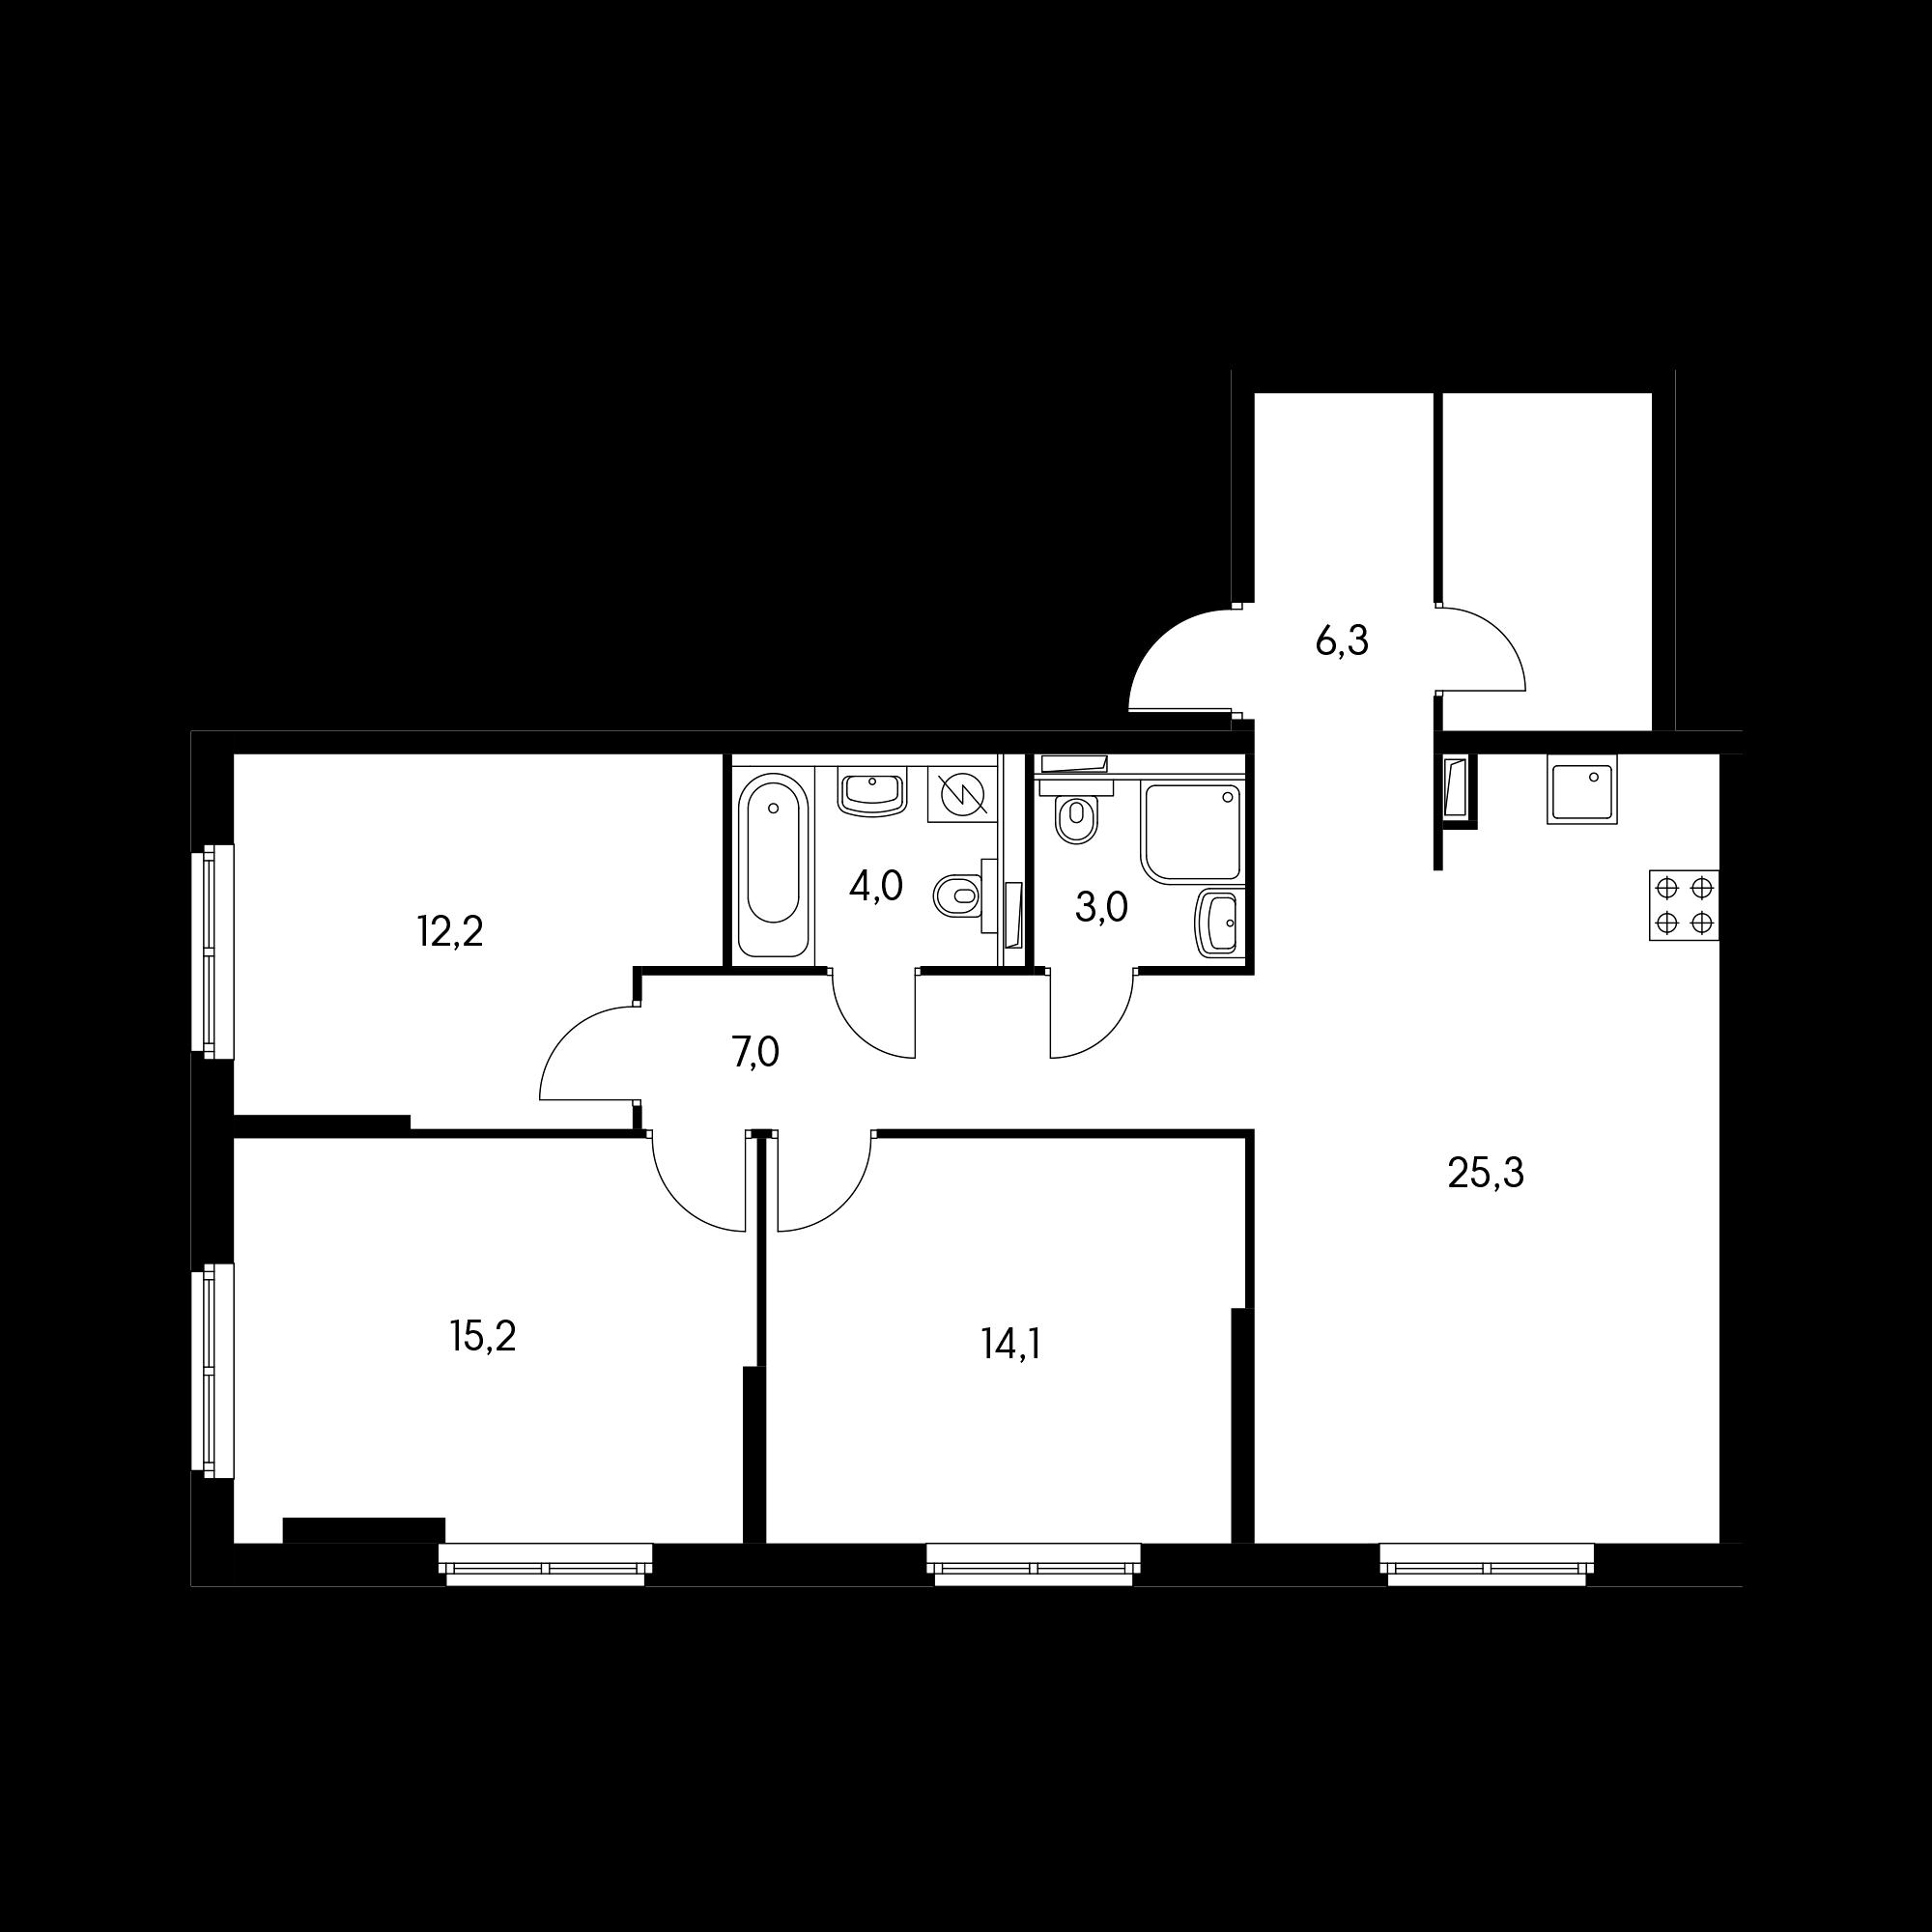 3EL1_4